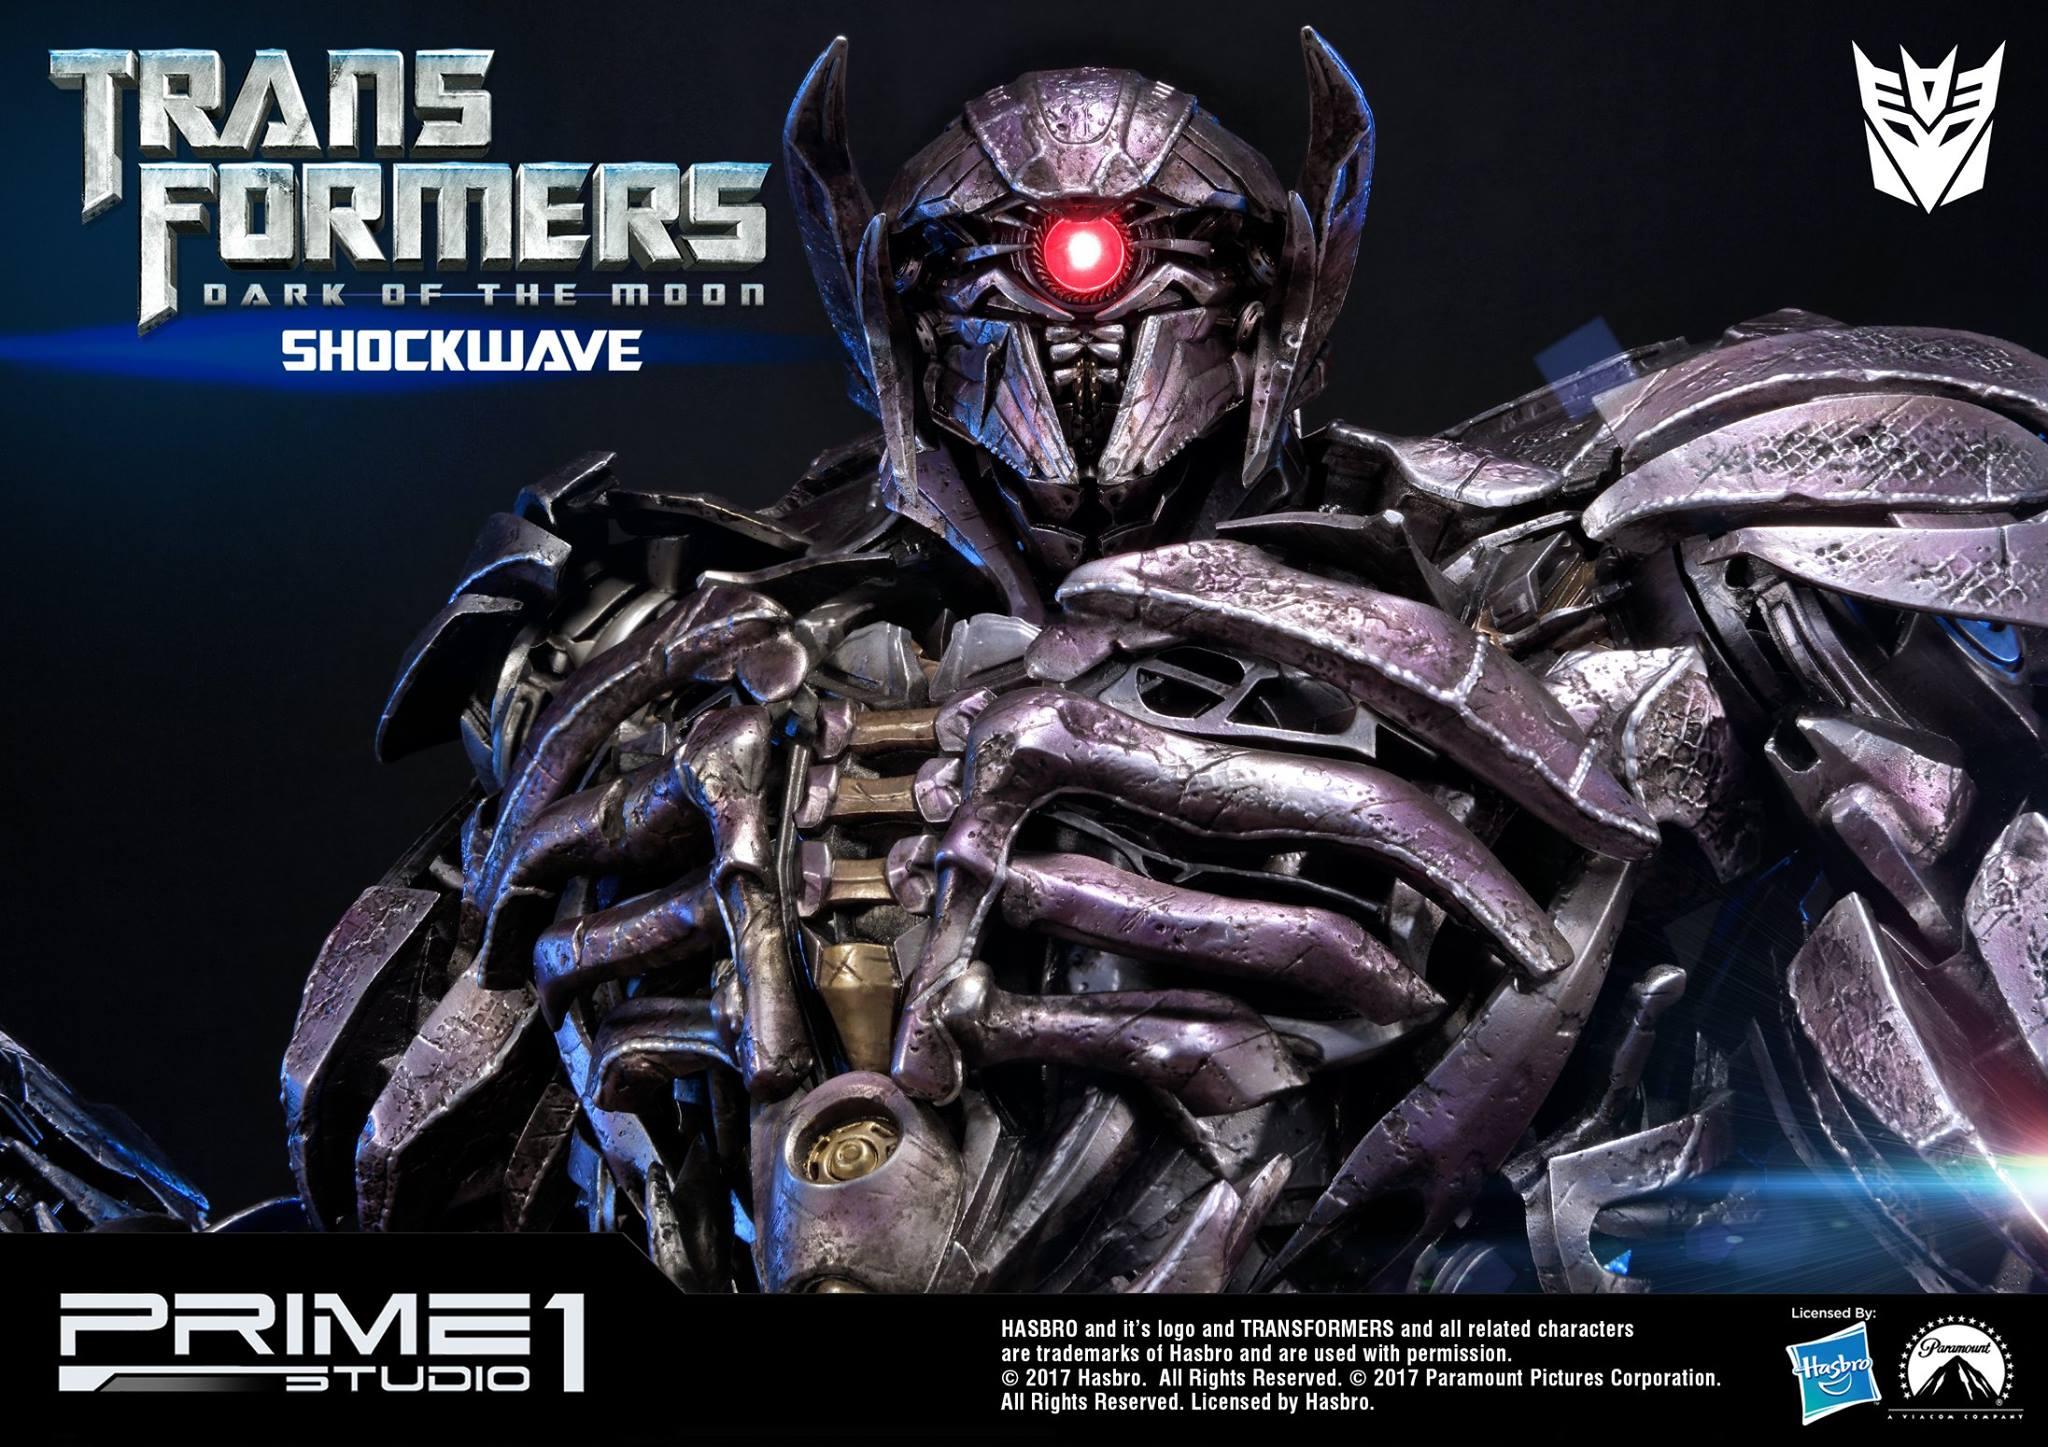 Prime1 Studio Dark of the Moon Shockwave Statue Details